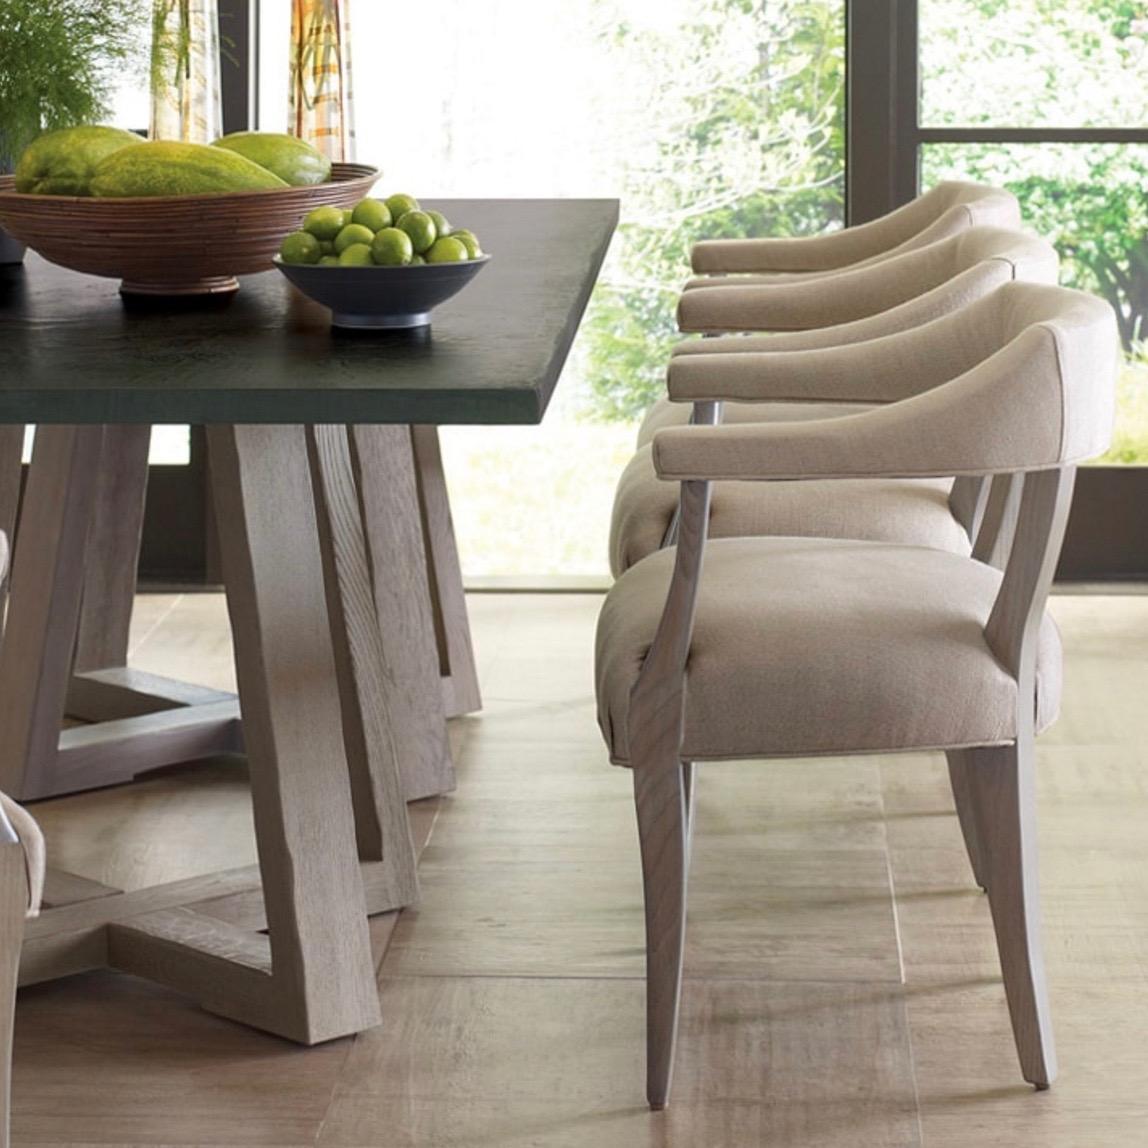 Saratoga Rectangular Dining Table « Newport Coast Interior